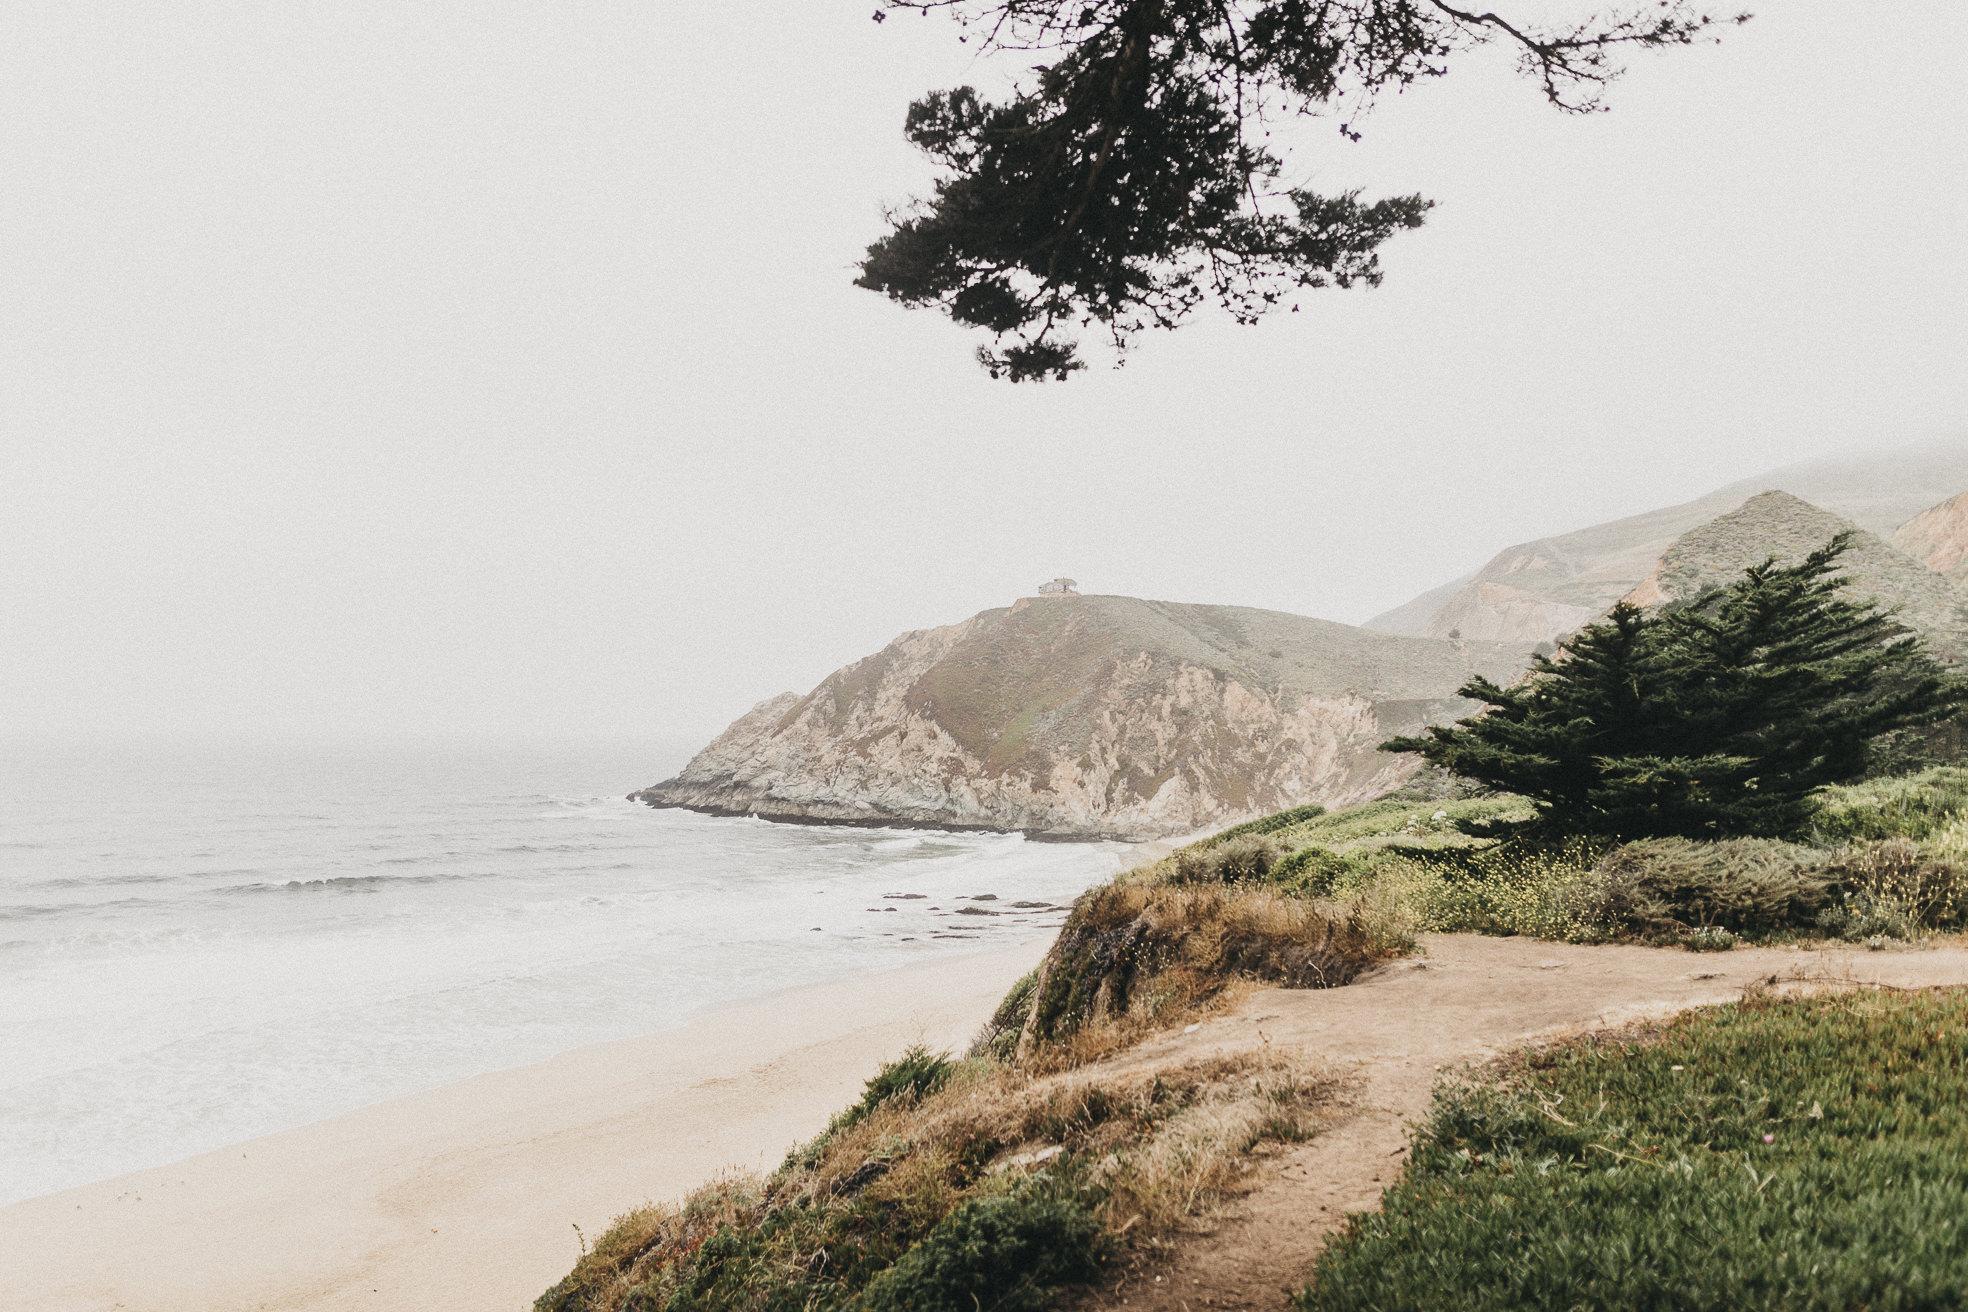 San-Francisco-BildervomLeben-9889